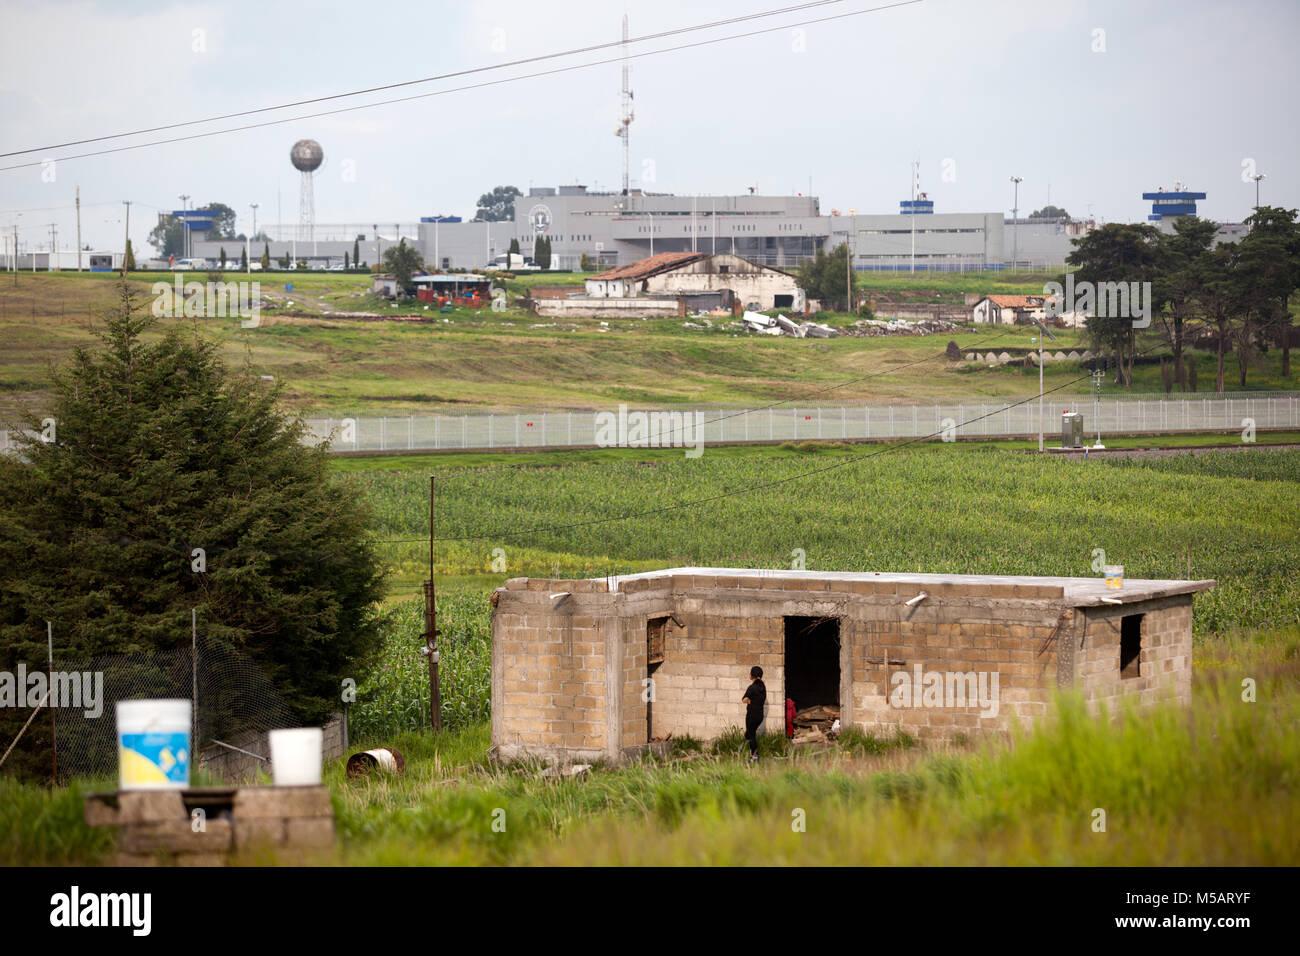 The Altiplano prison from which Joaquin 'El Chapo' Guzman escaped near Toluca, Mexico on Wednesday, July - Stock Image